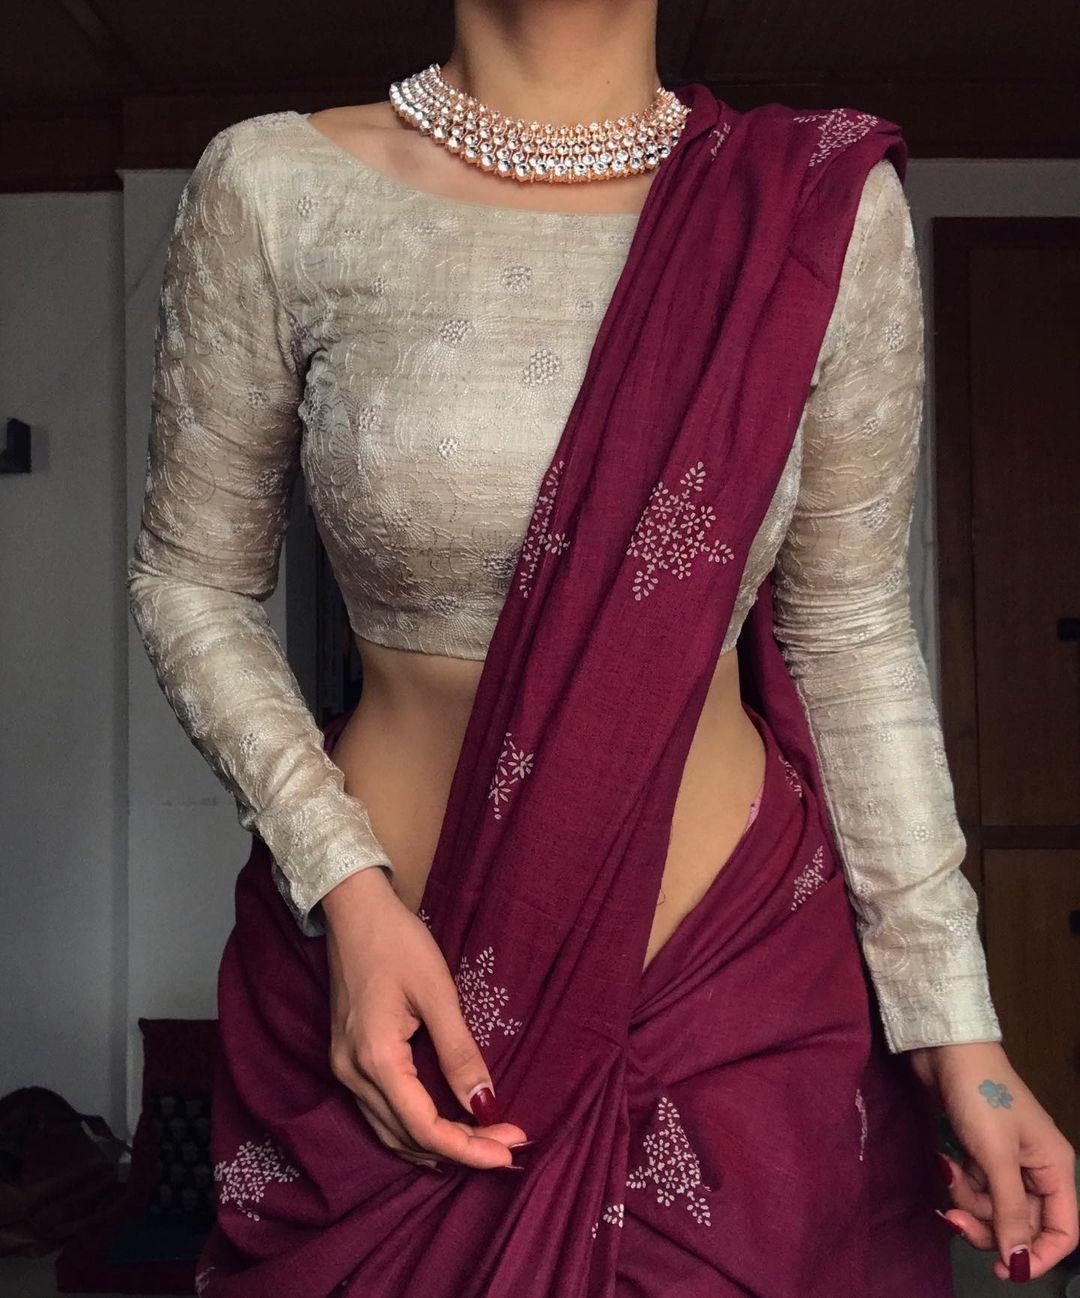 2 120 Likes 0 Comments Margazhii Margazhidesigns On Instagram Janua In 2021 Saree Jacket Designs Fashionable Saree Blouse Designs Saree Blouse Designs Latest